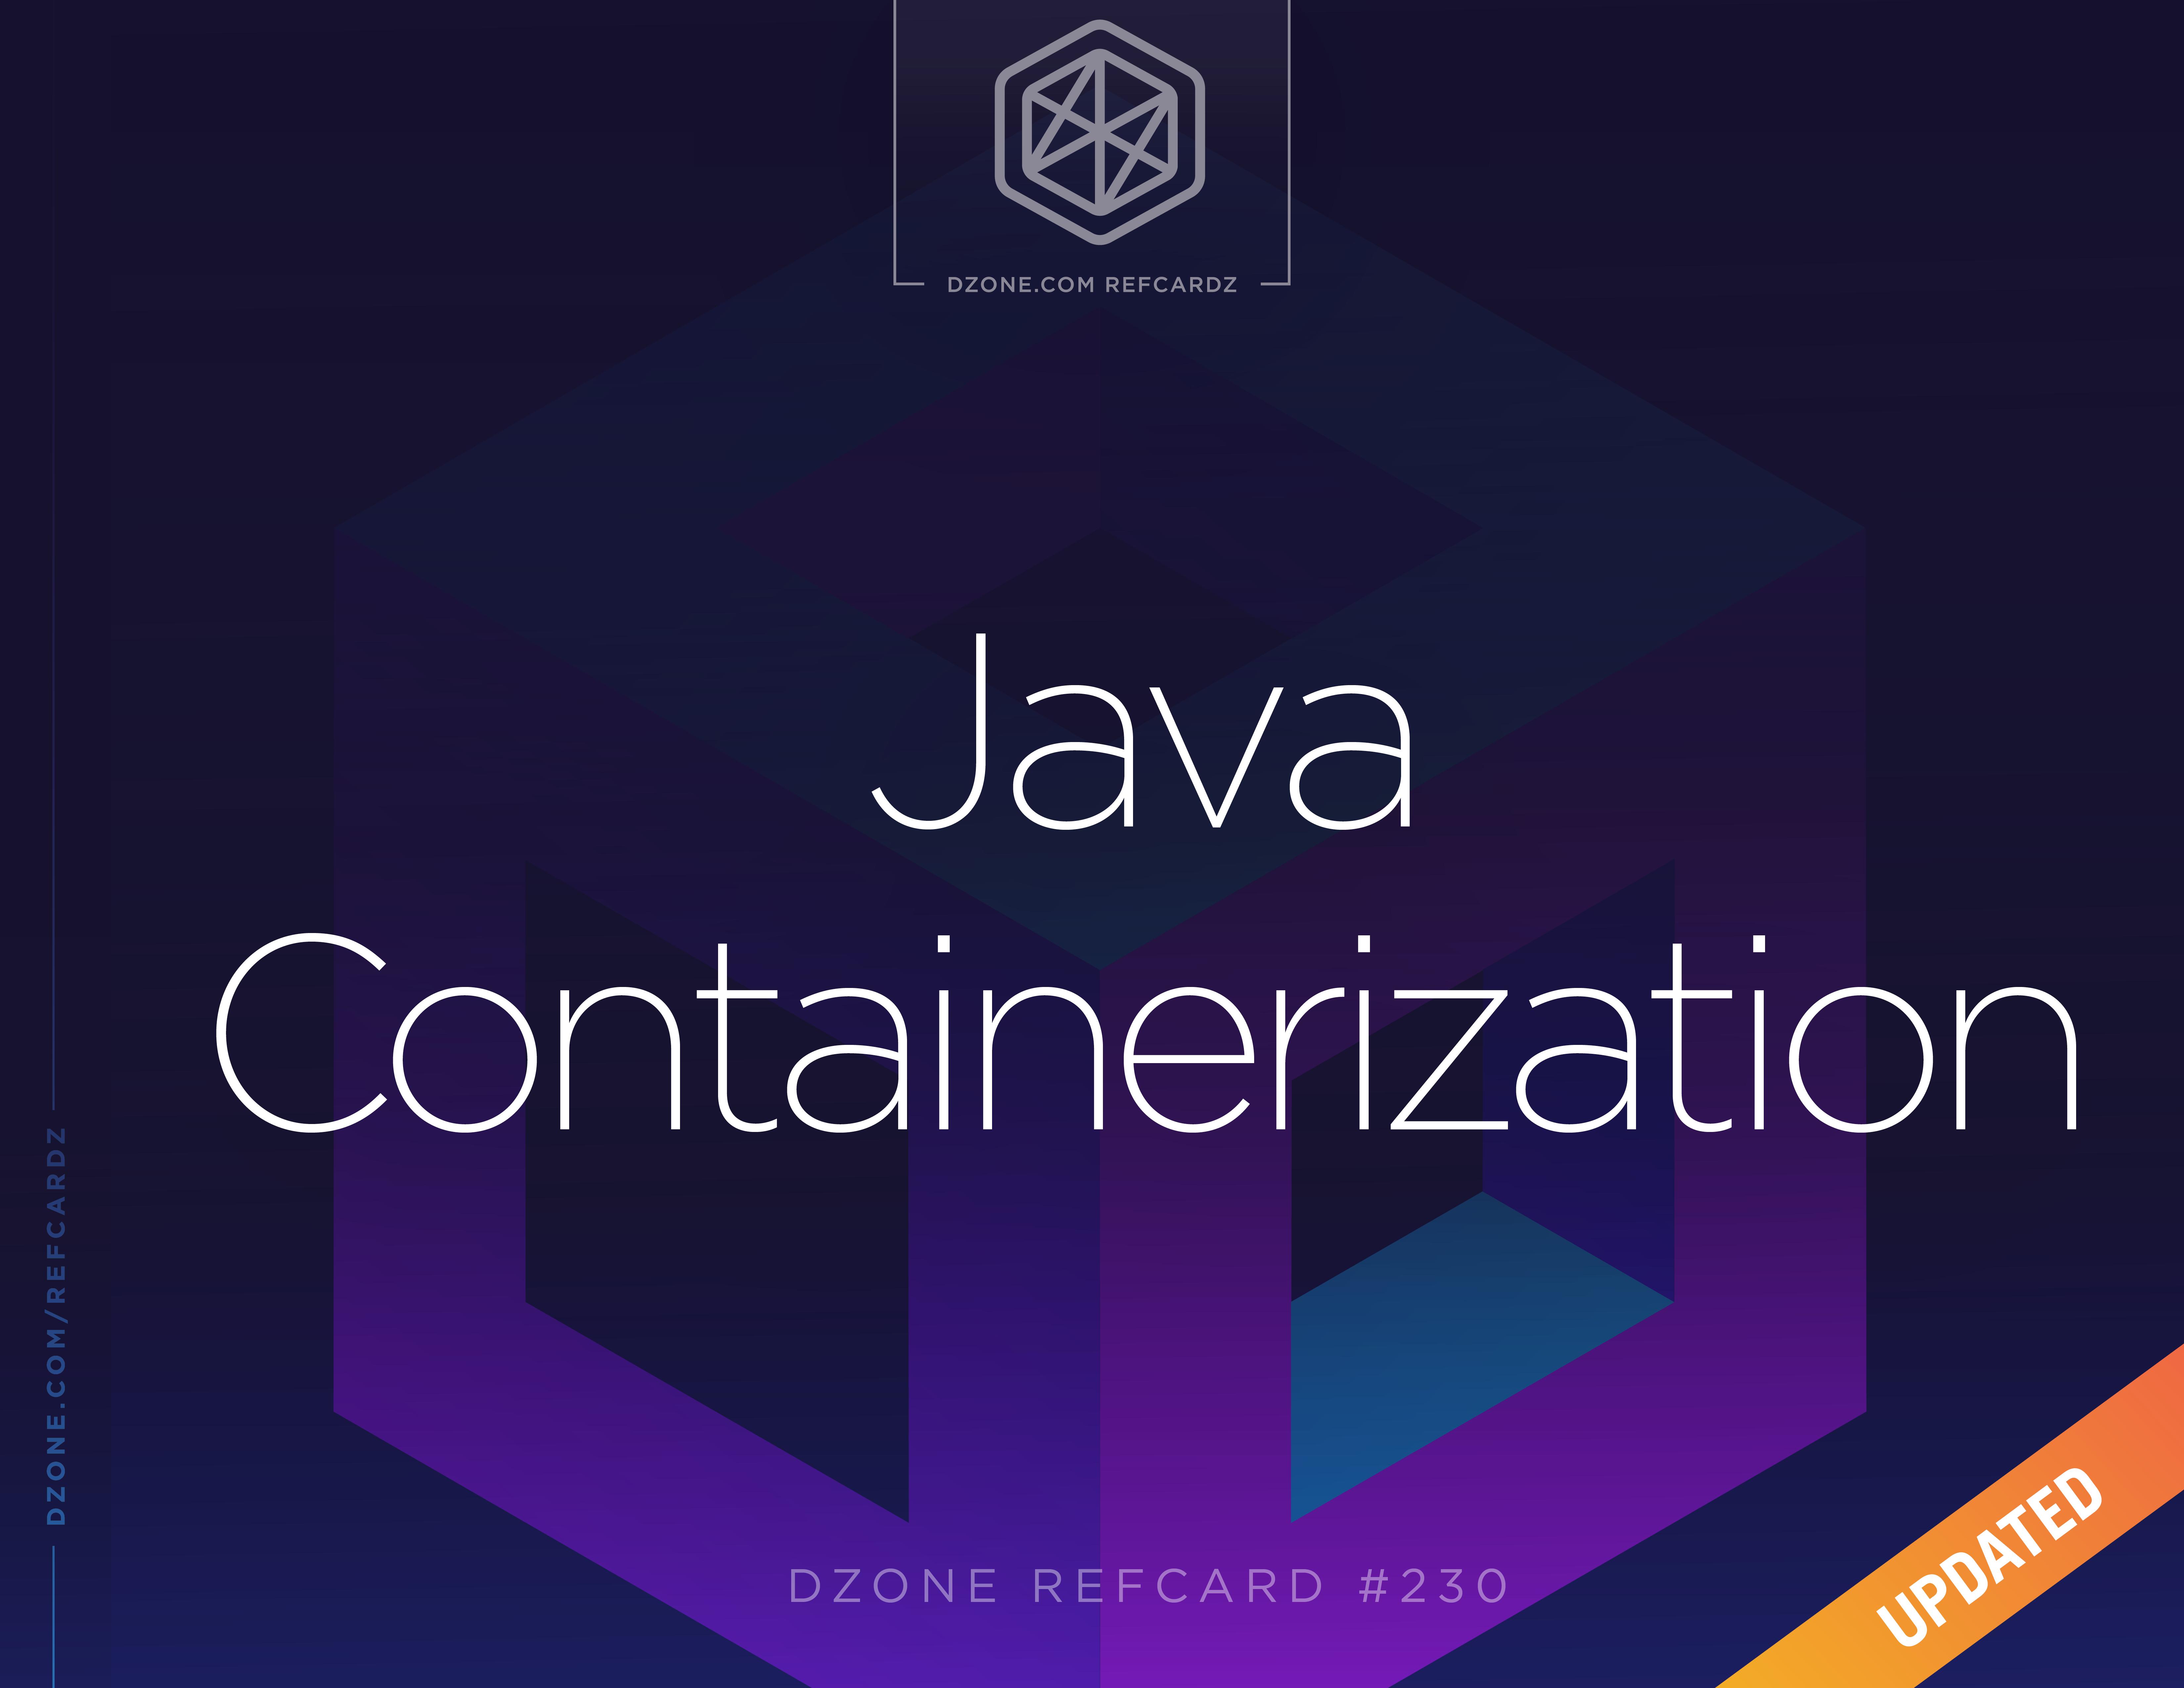 Java Containerization - DZone - Refcardz